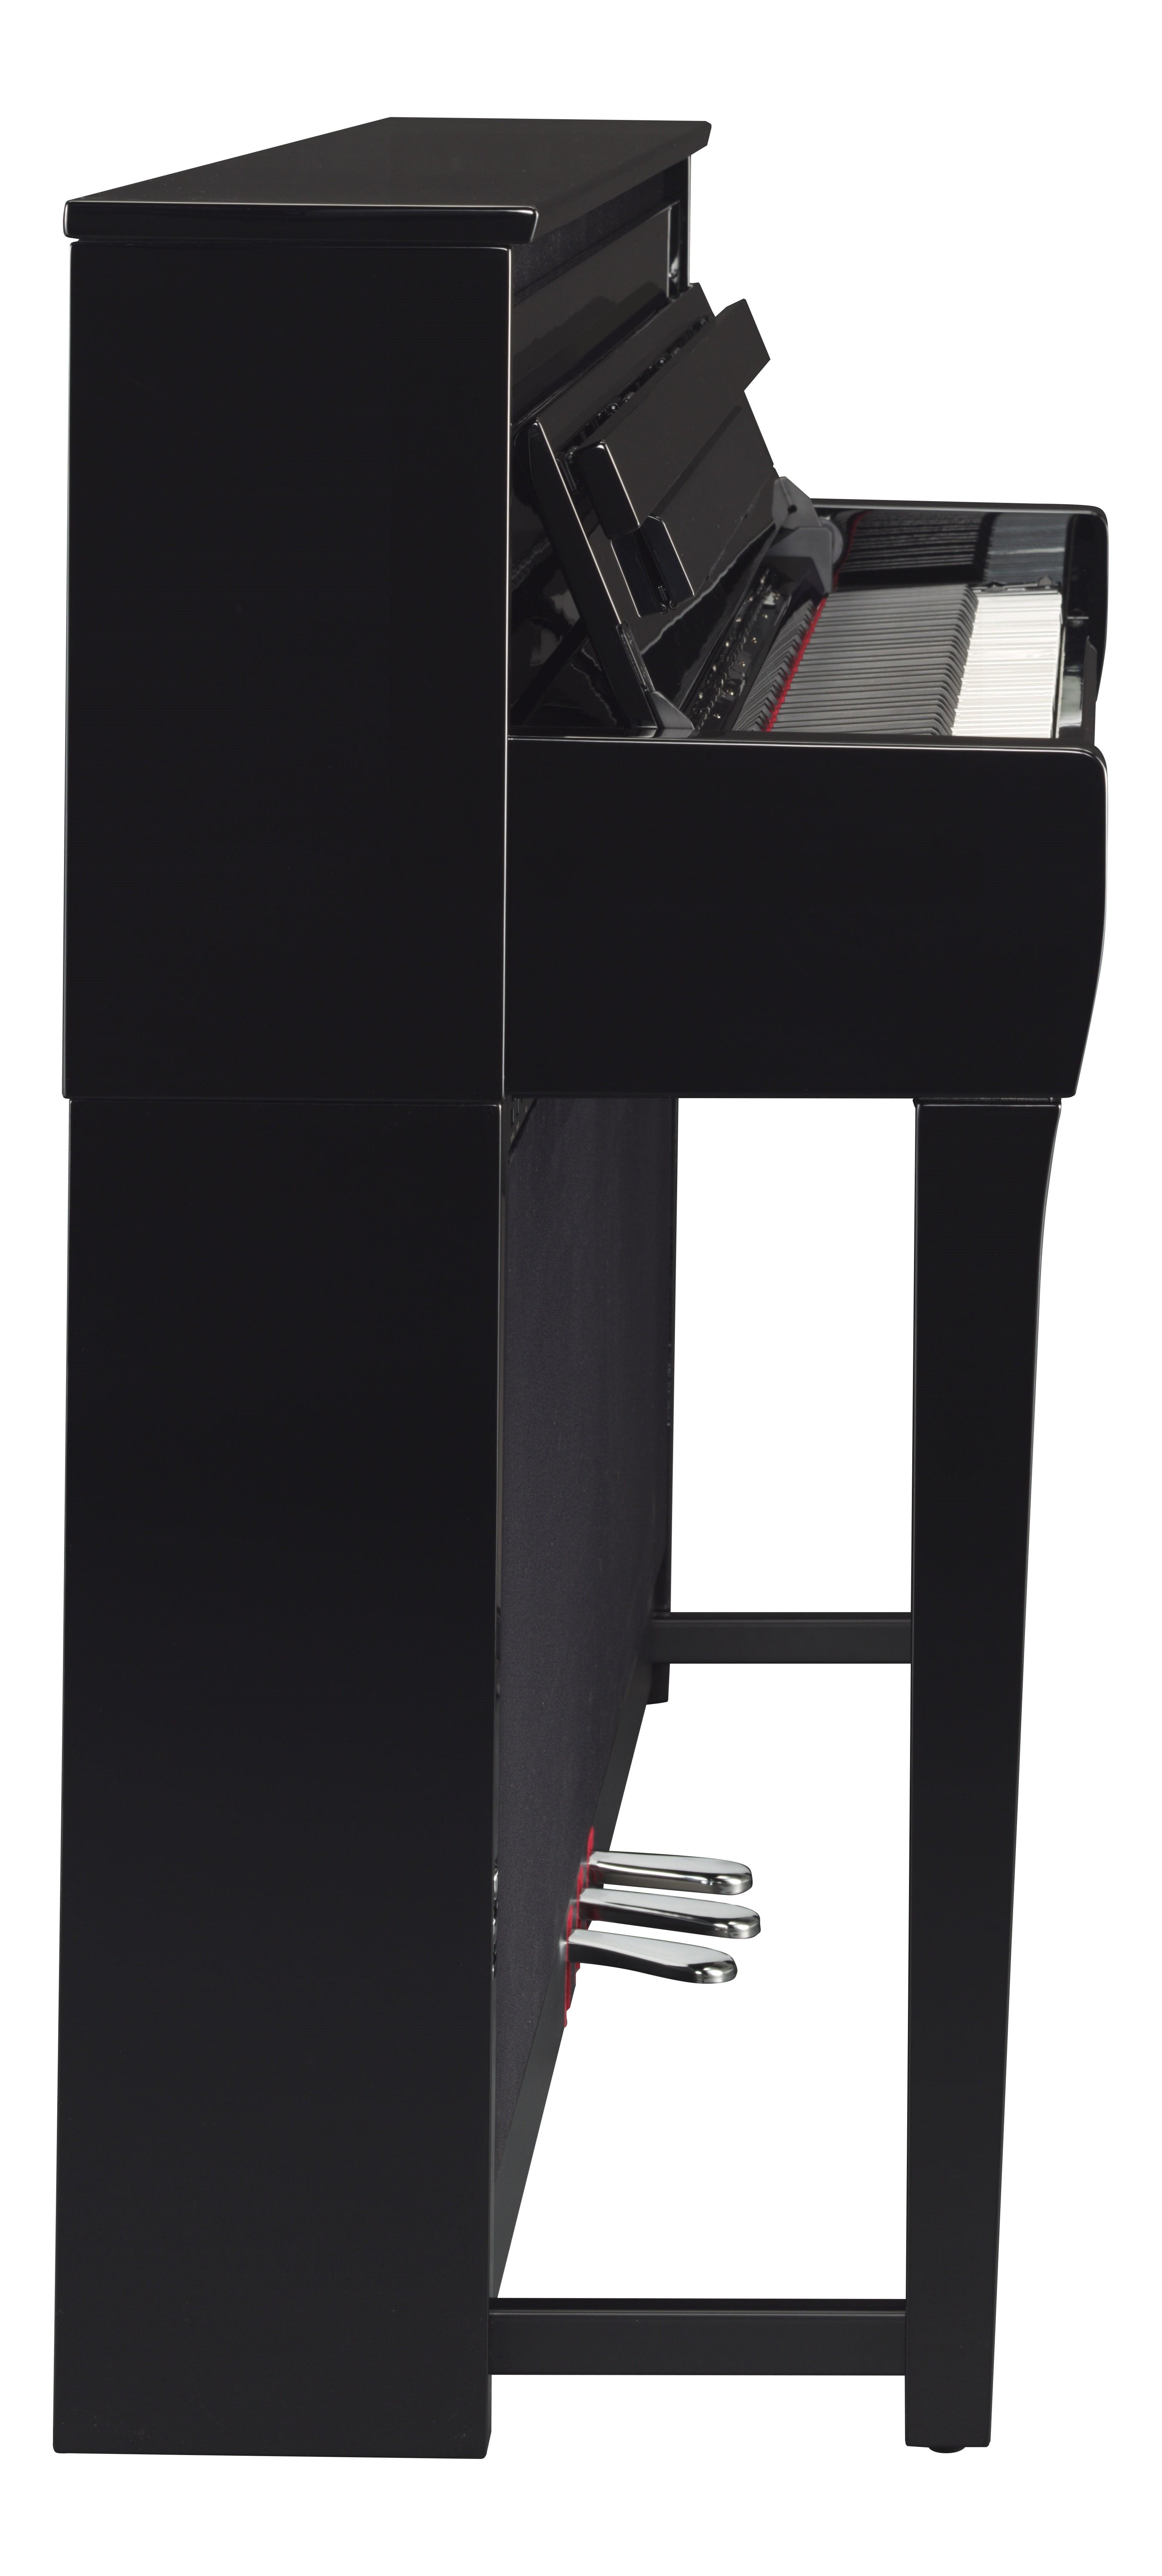 piano digital yamaha clp 685. Black Bedroom Furniture Sets. Home Design Ideas